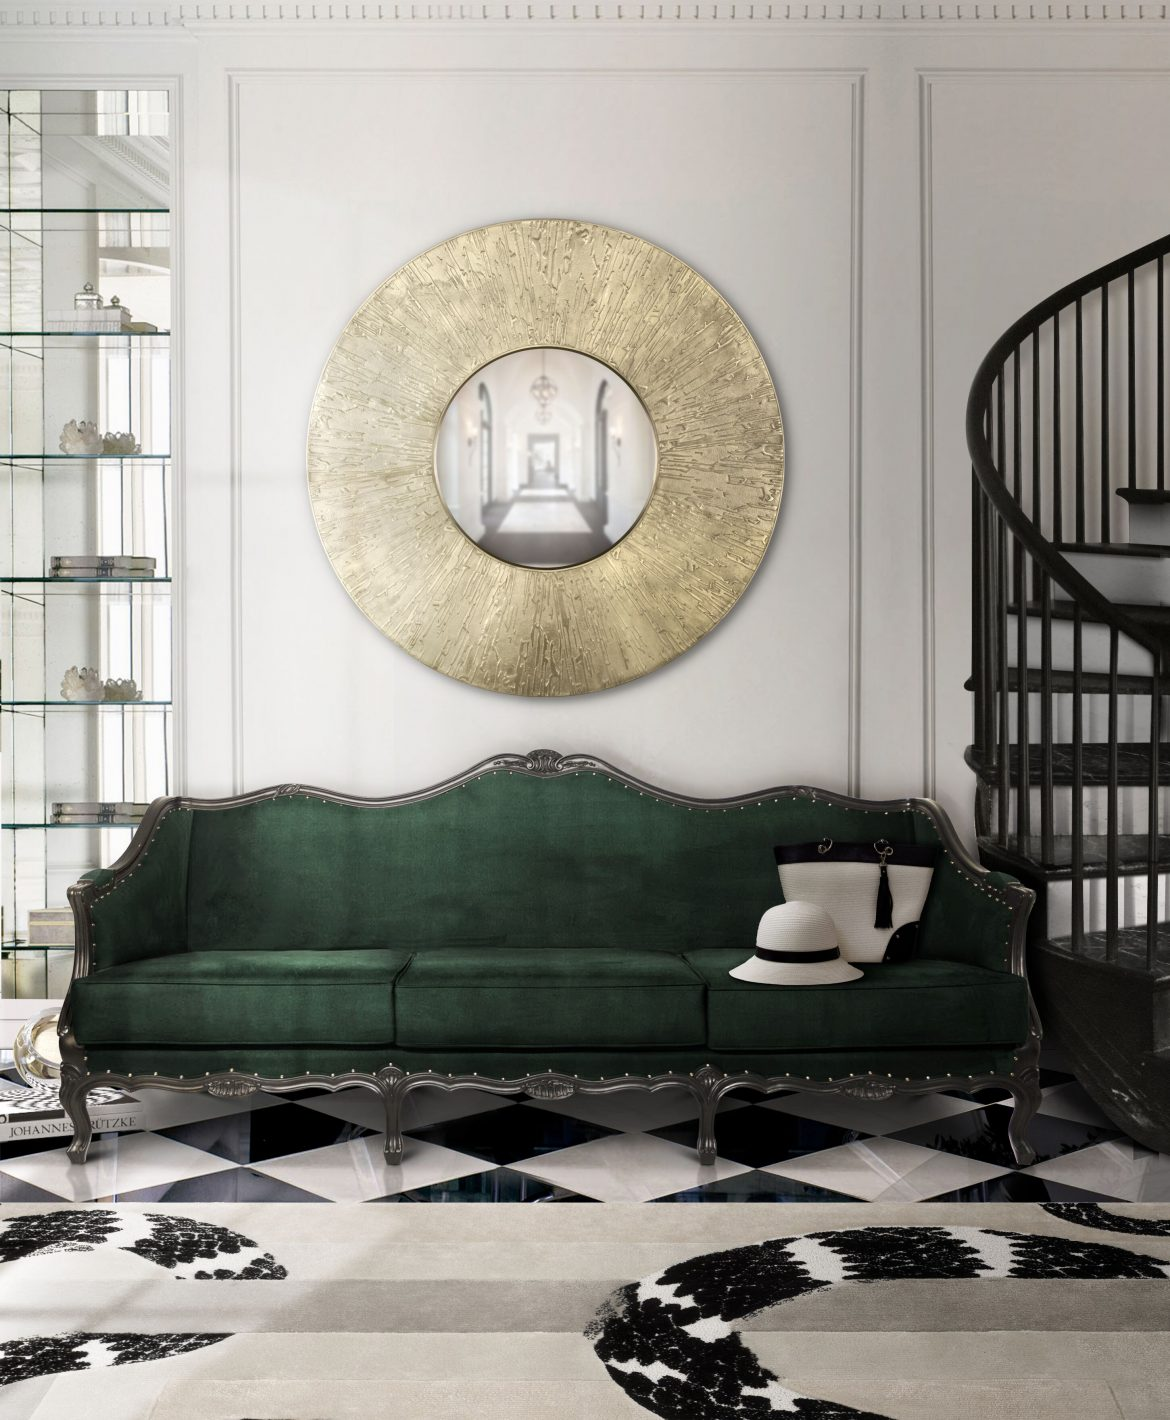 living room ideas 30 Best Living Room Ideas For 2020 best living room ideas 2020 12